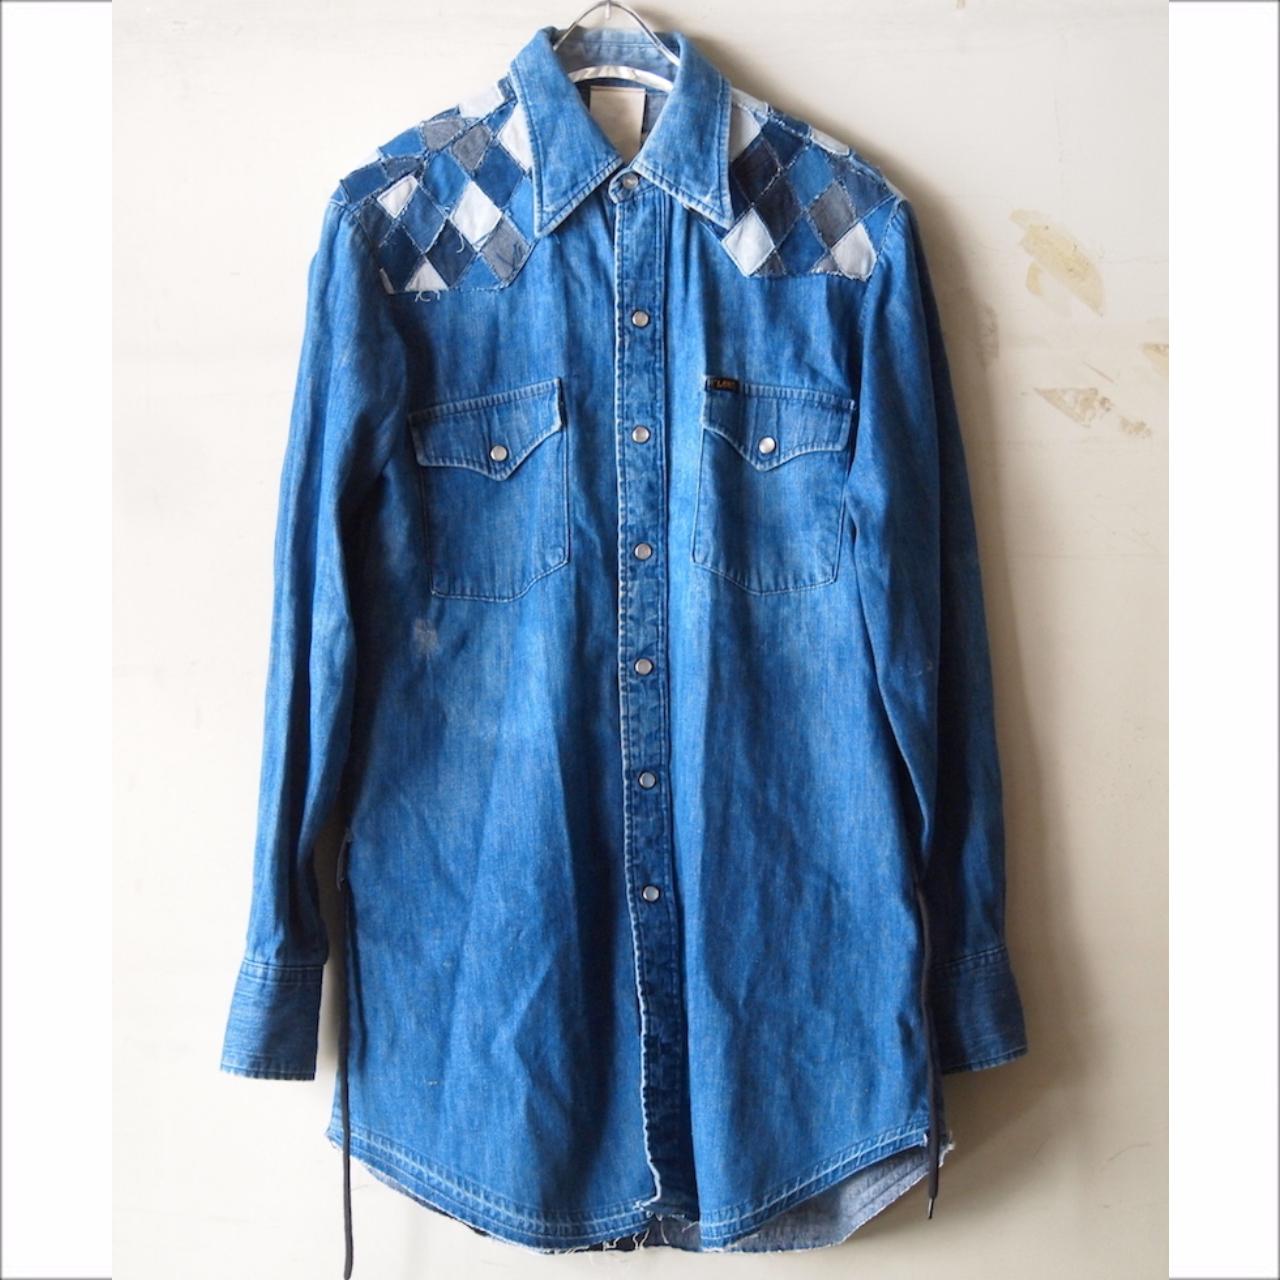 【sandglass】argyle denim shirt B / 【サンドグラス】アーガイル デニム シャツ ビー